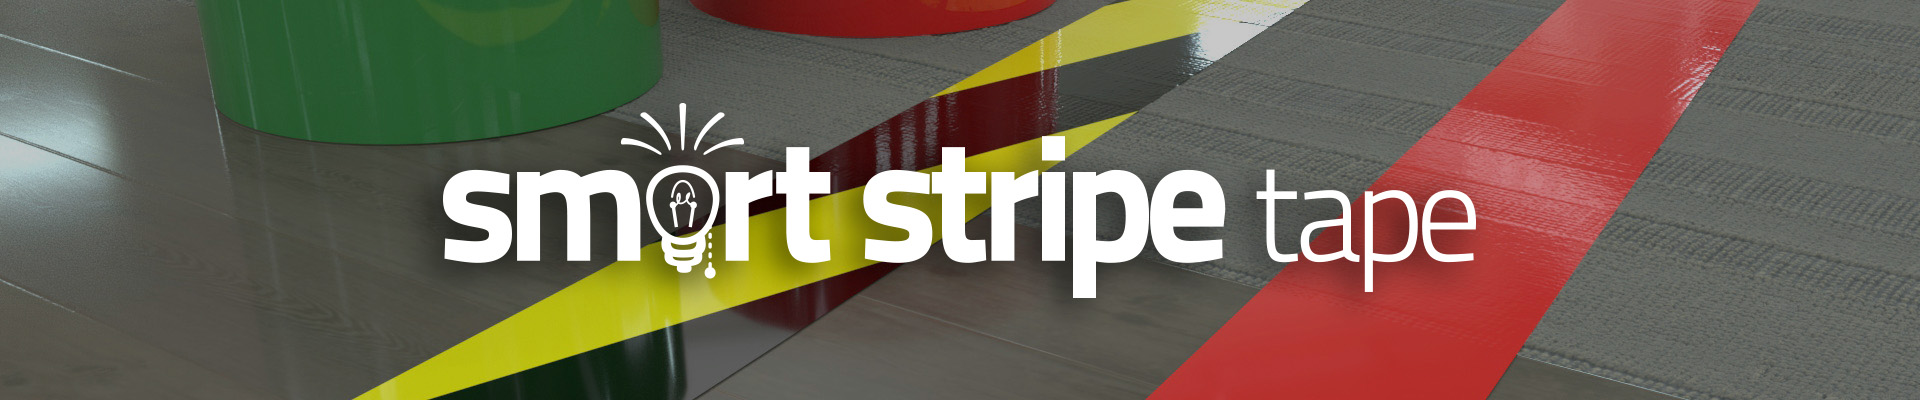 Smart Stripe Tape Header